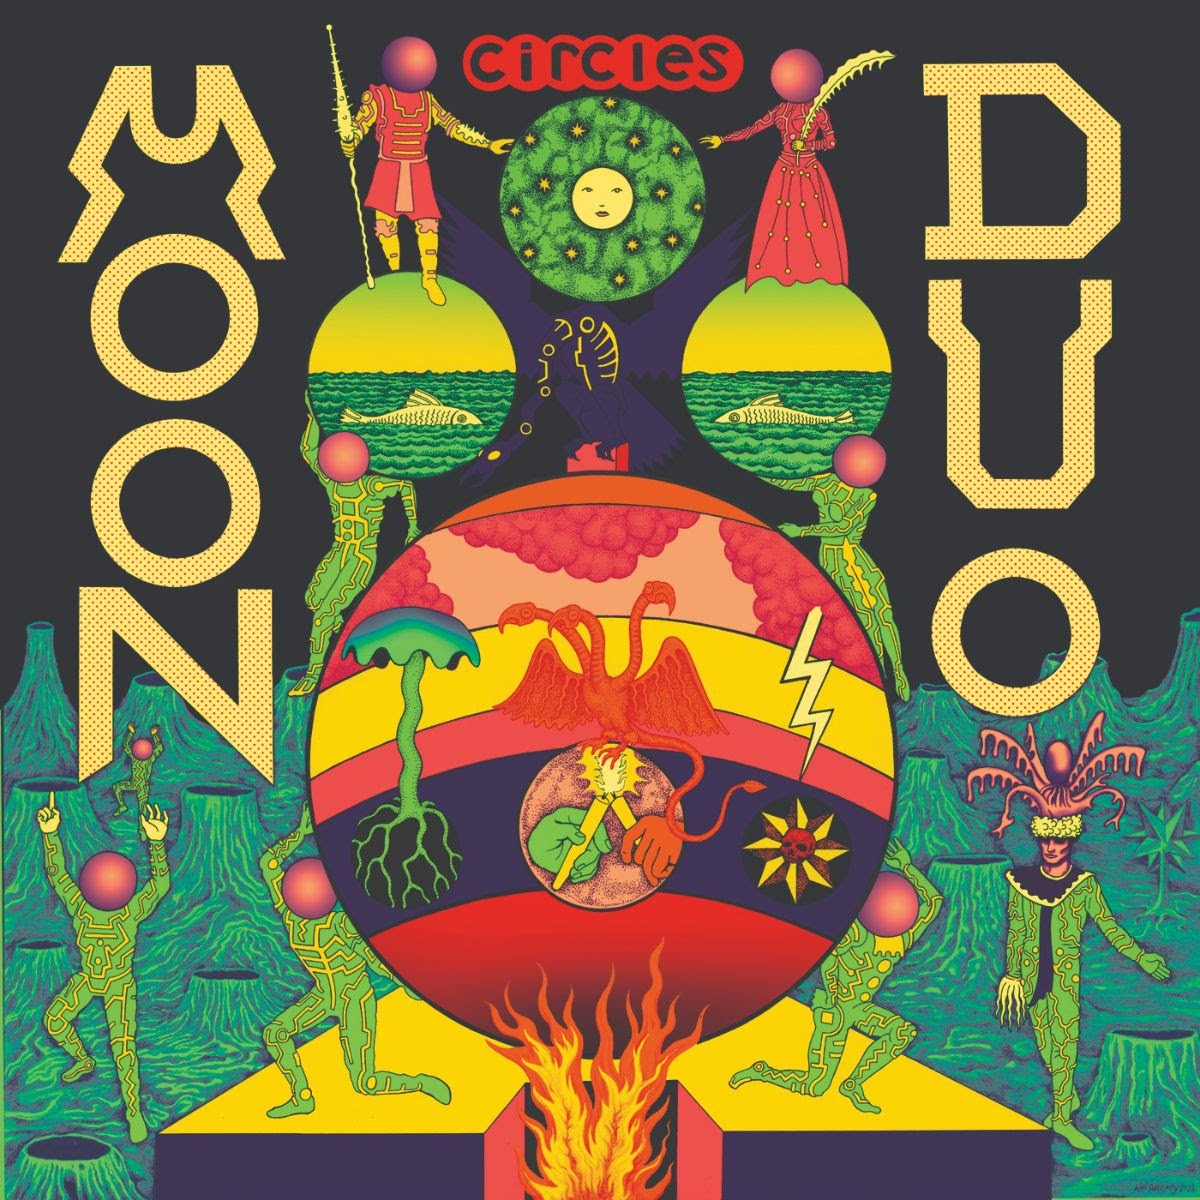 Moon Duo - Circles [LP] (Green Vinyl)